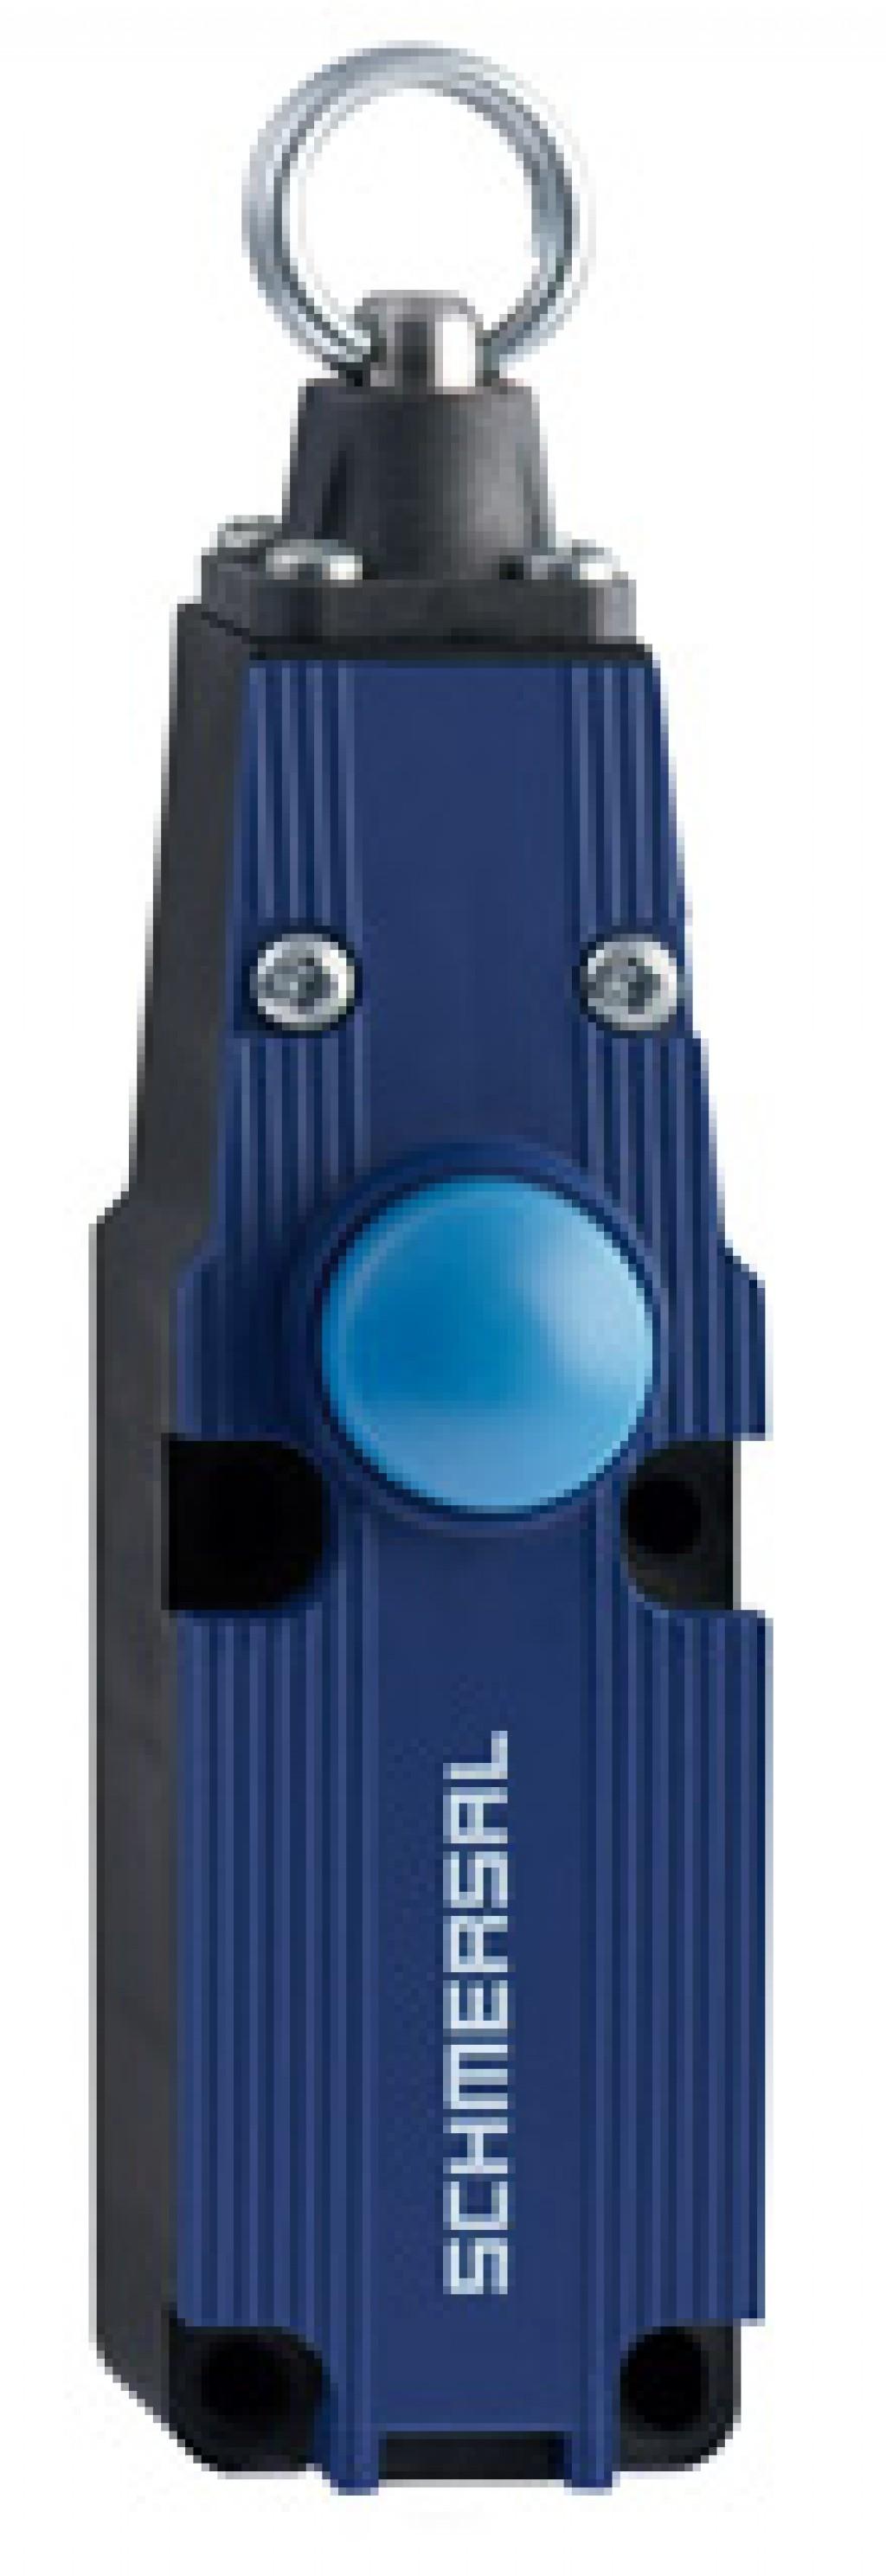 Chave de Emergência ZQ 700-02